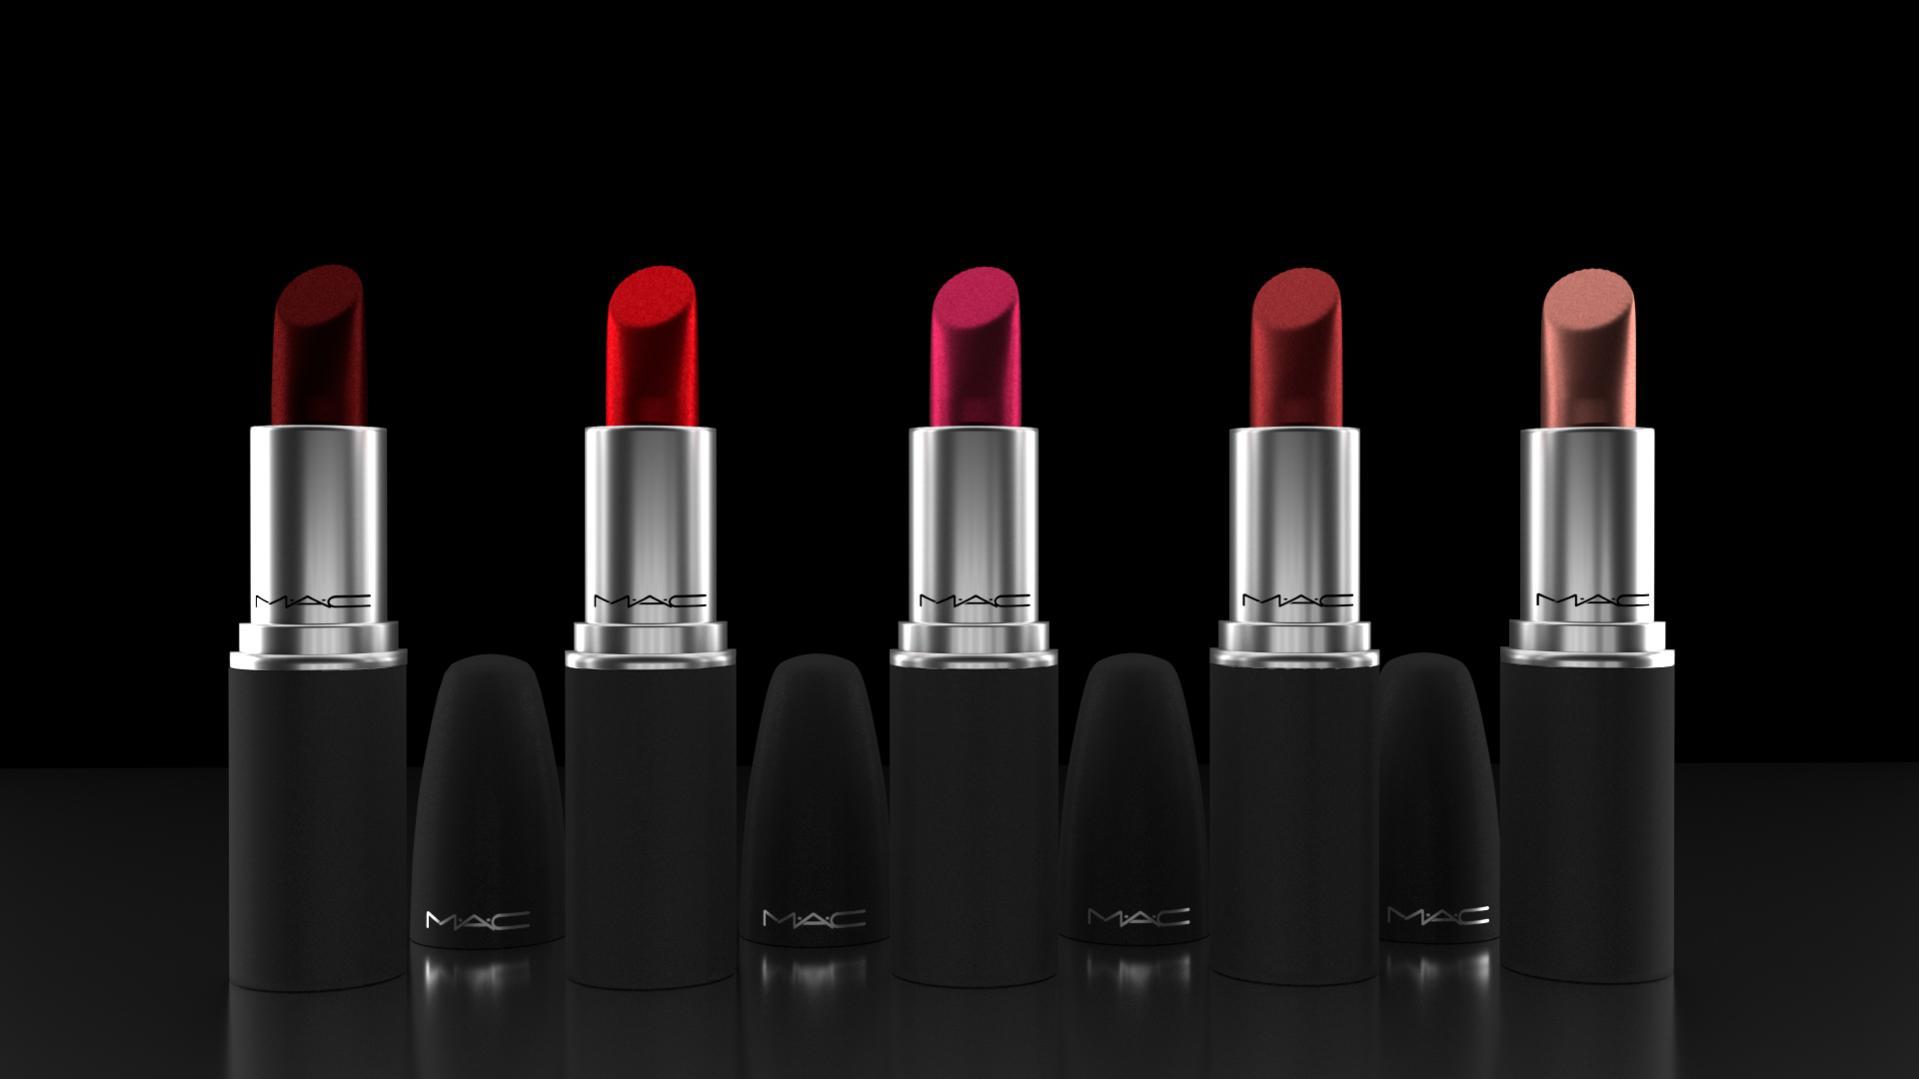 Mac Lipstick Ad Non Commercial Use Works In Progress